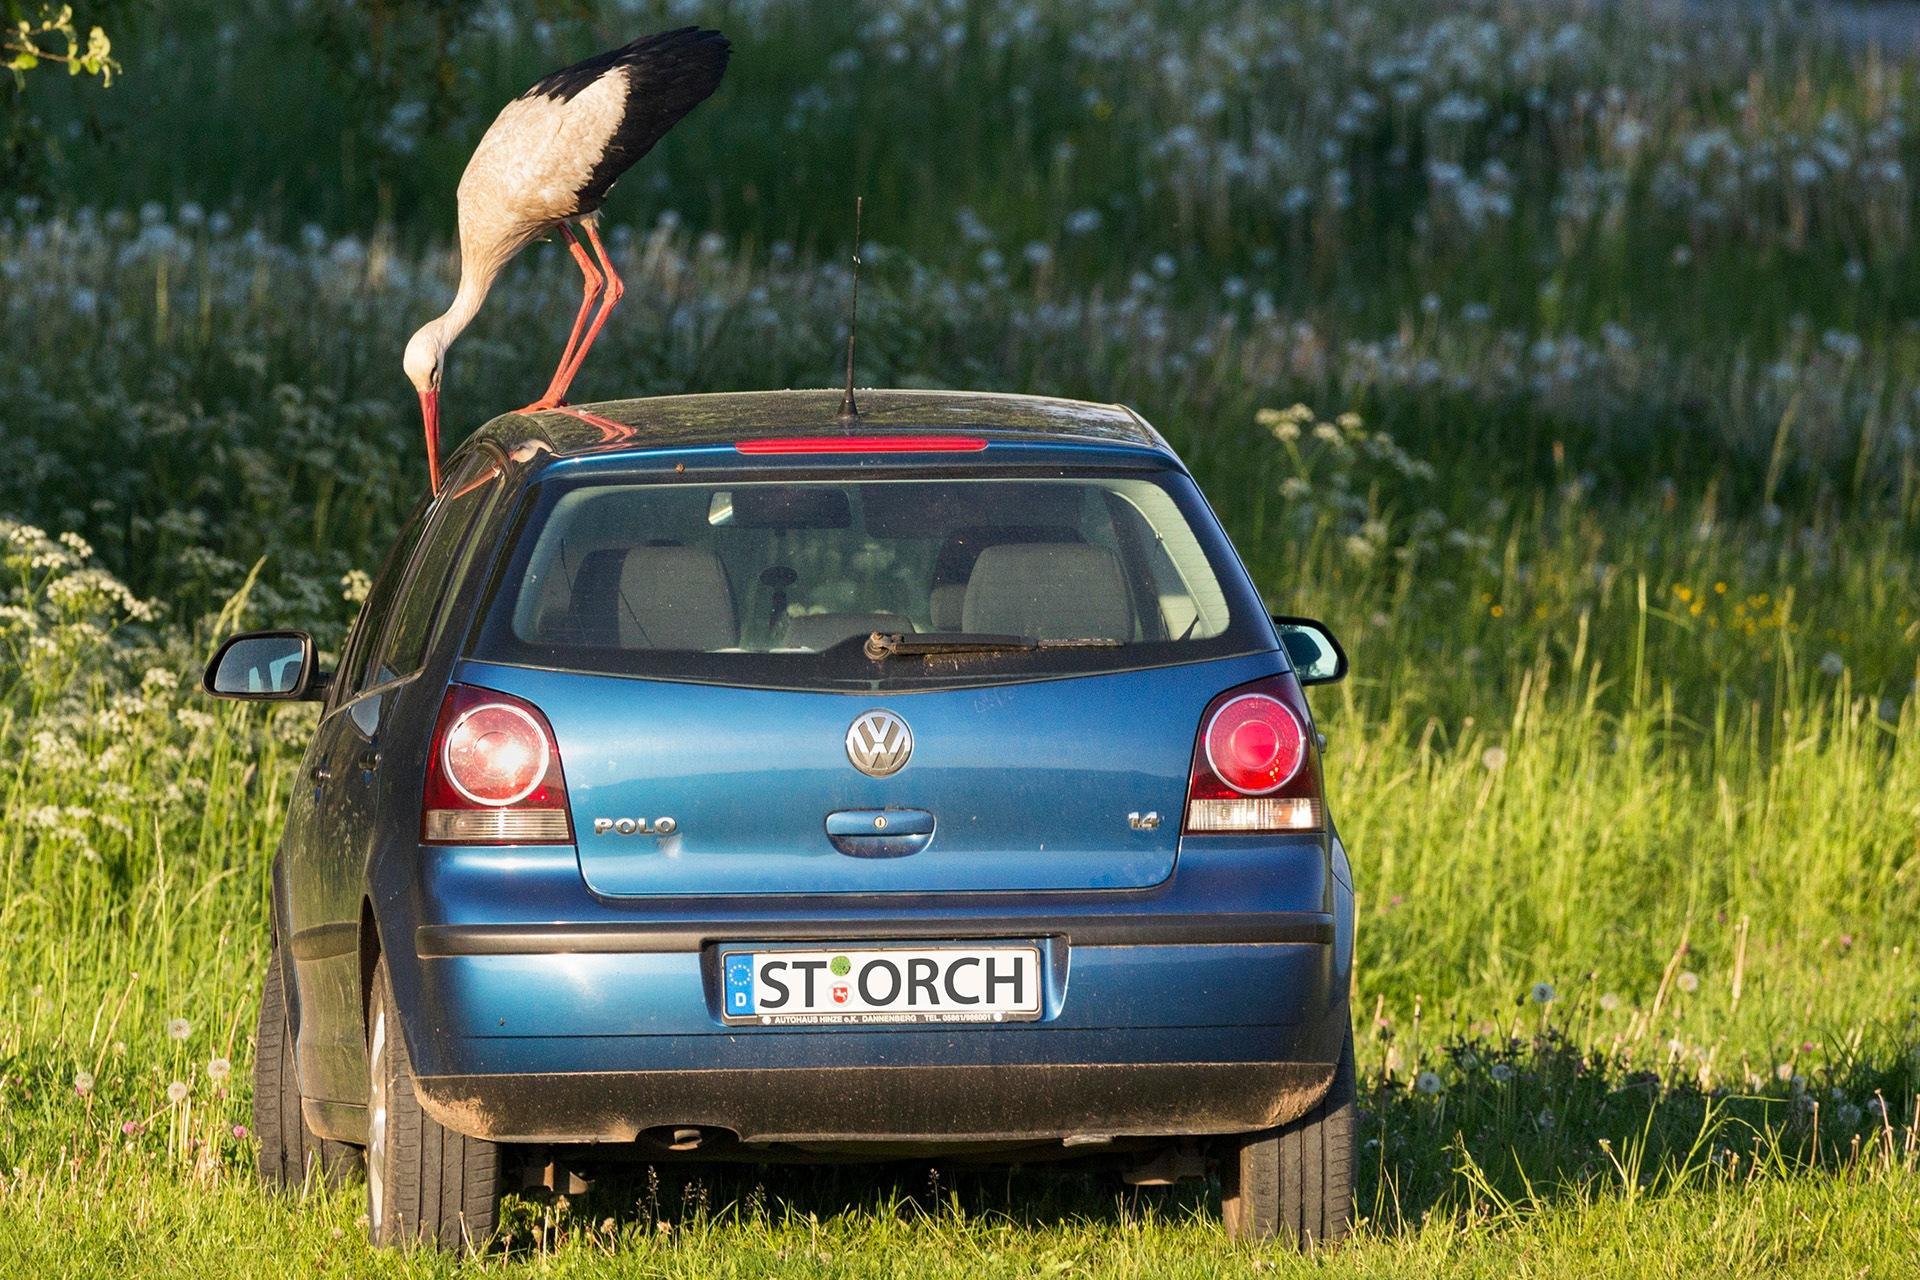 Stork on a car 3 by Maik Richter Photography